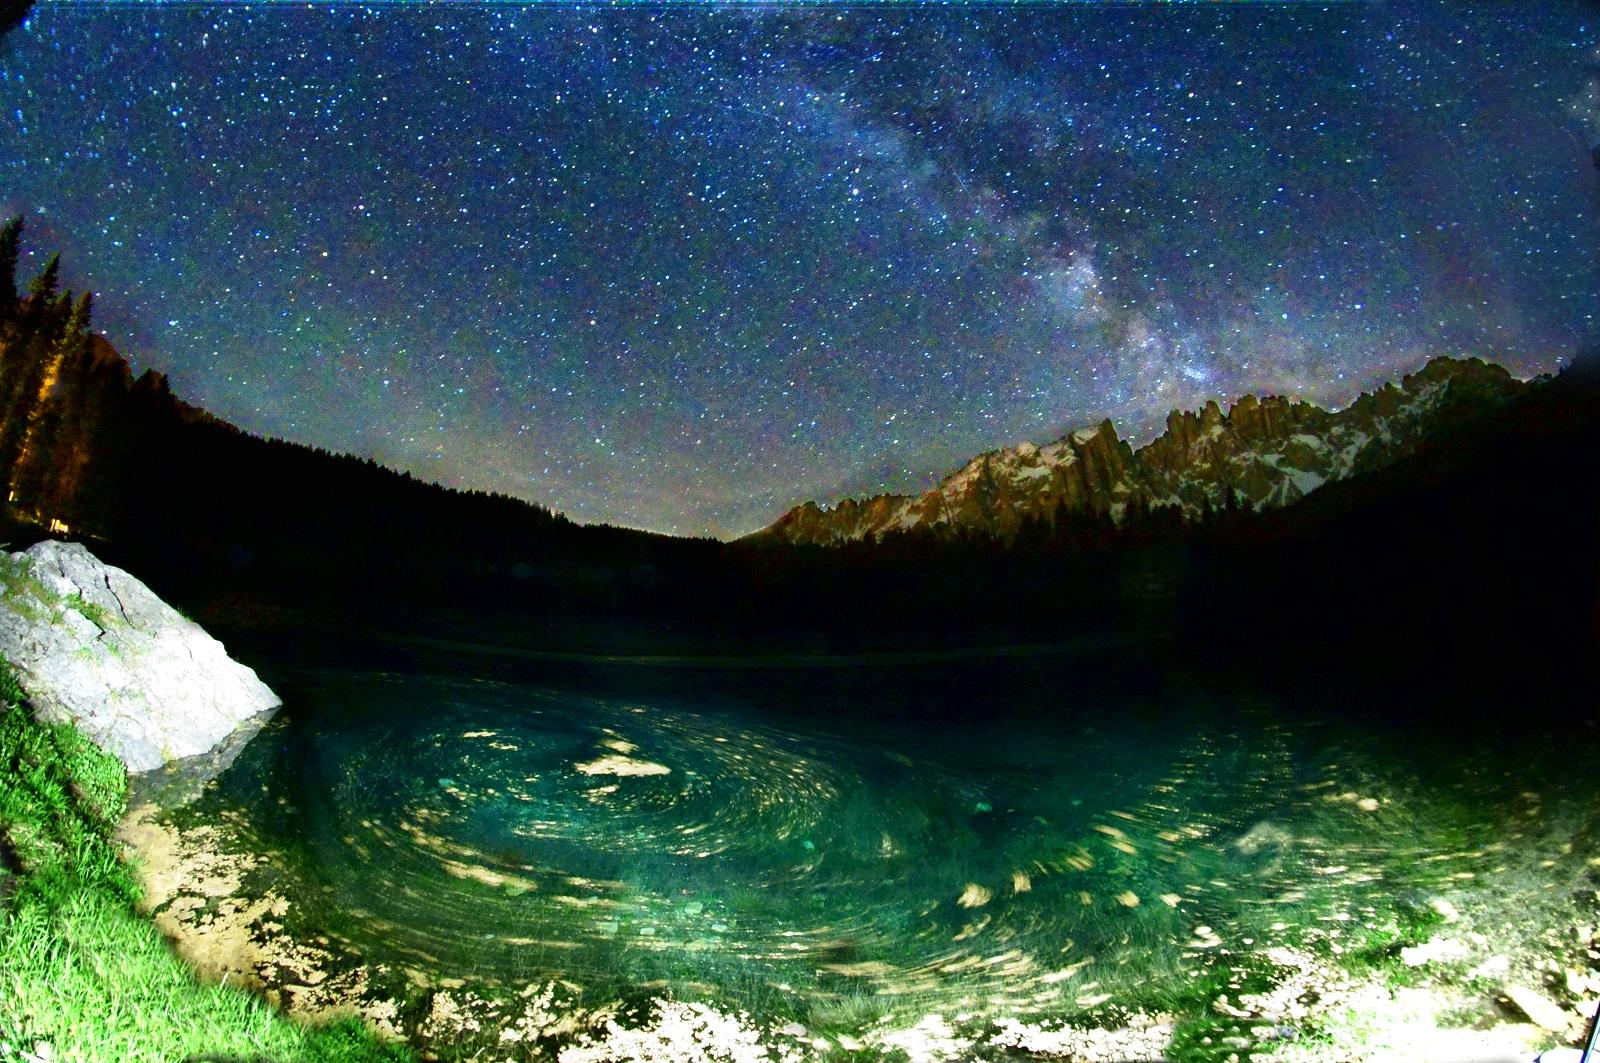 karersee by night